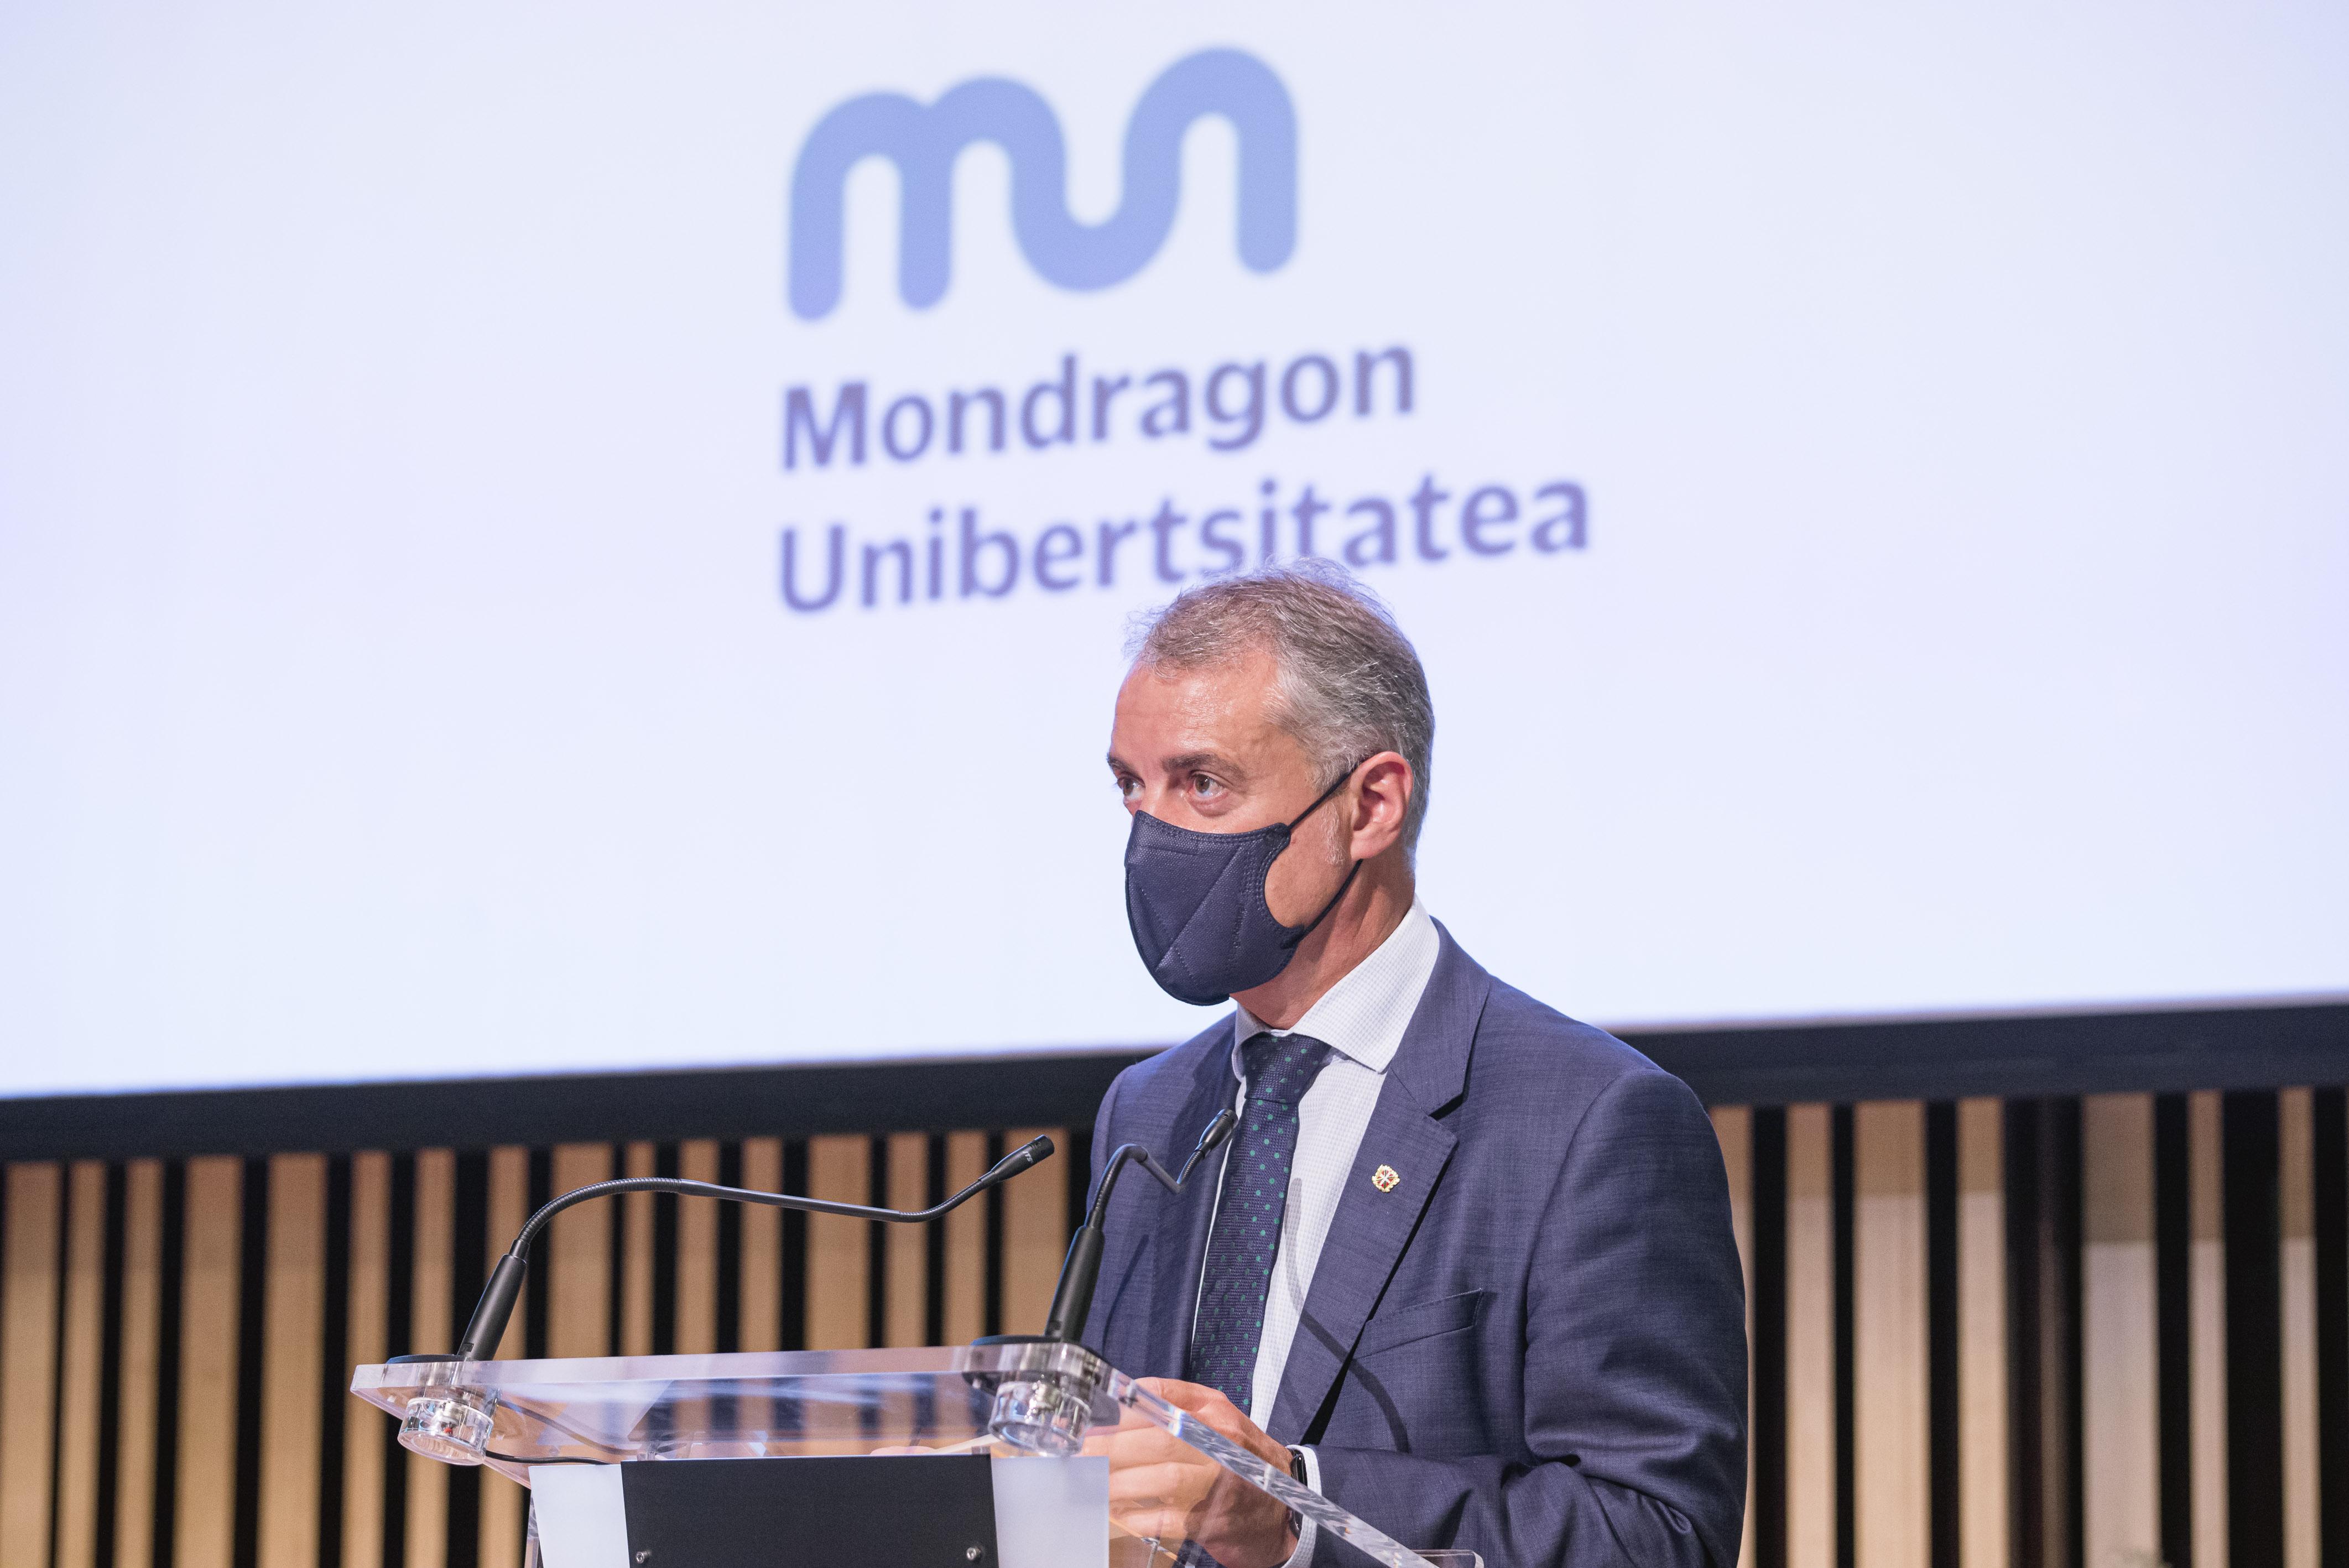 Mondragon_uni_donostia17-9-2021_usual-9821.jpg